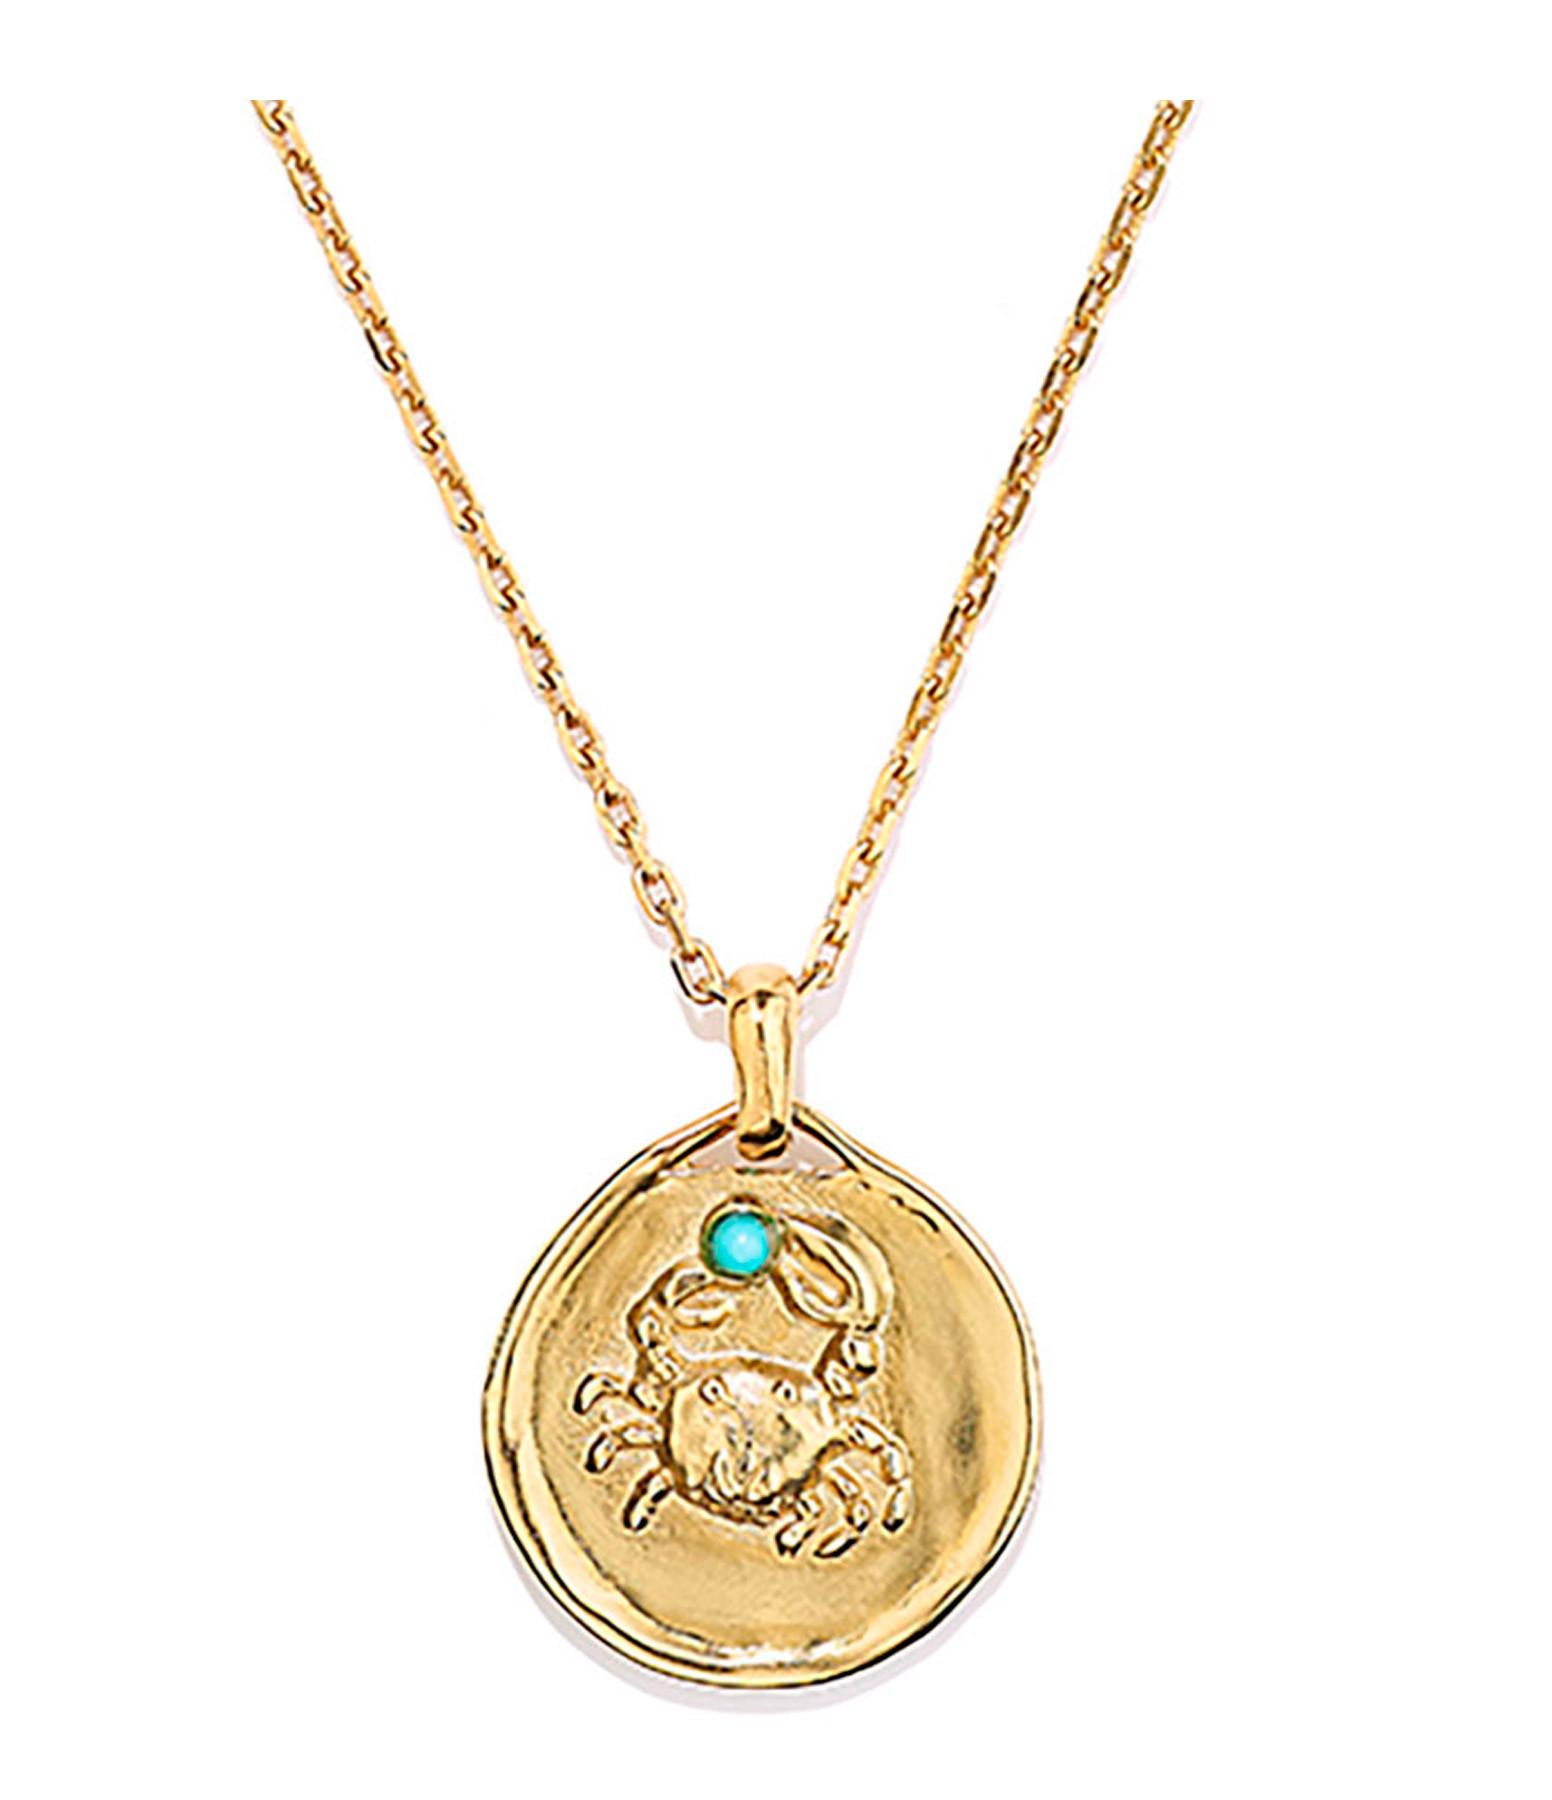 GOOSSENS - Collier Talisman Mini Astro Cancer Turquoise Plaqué Or